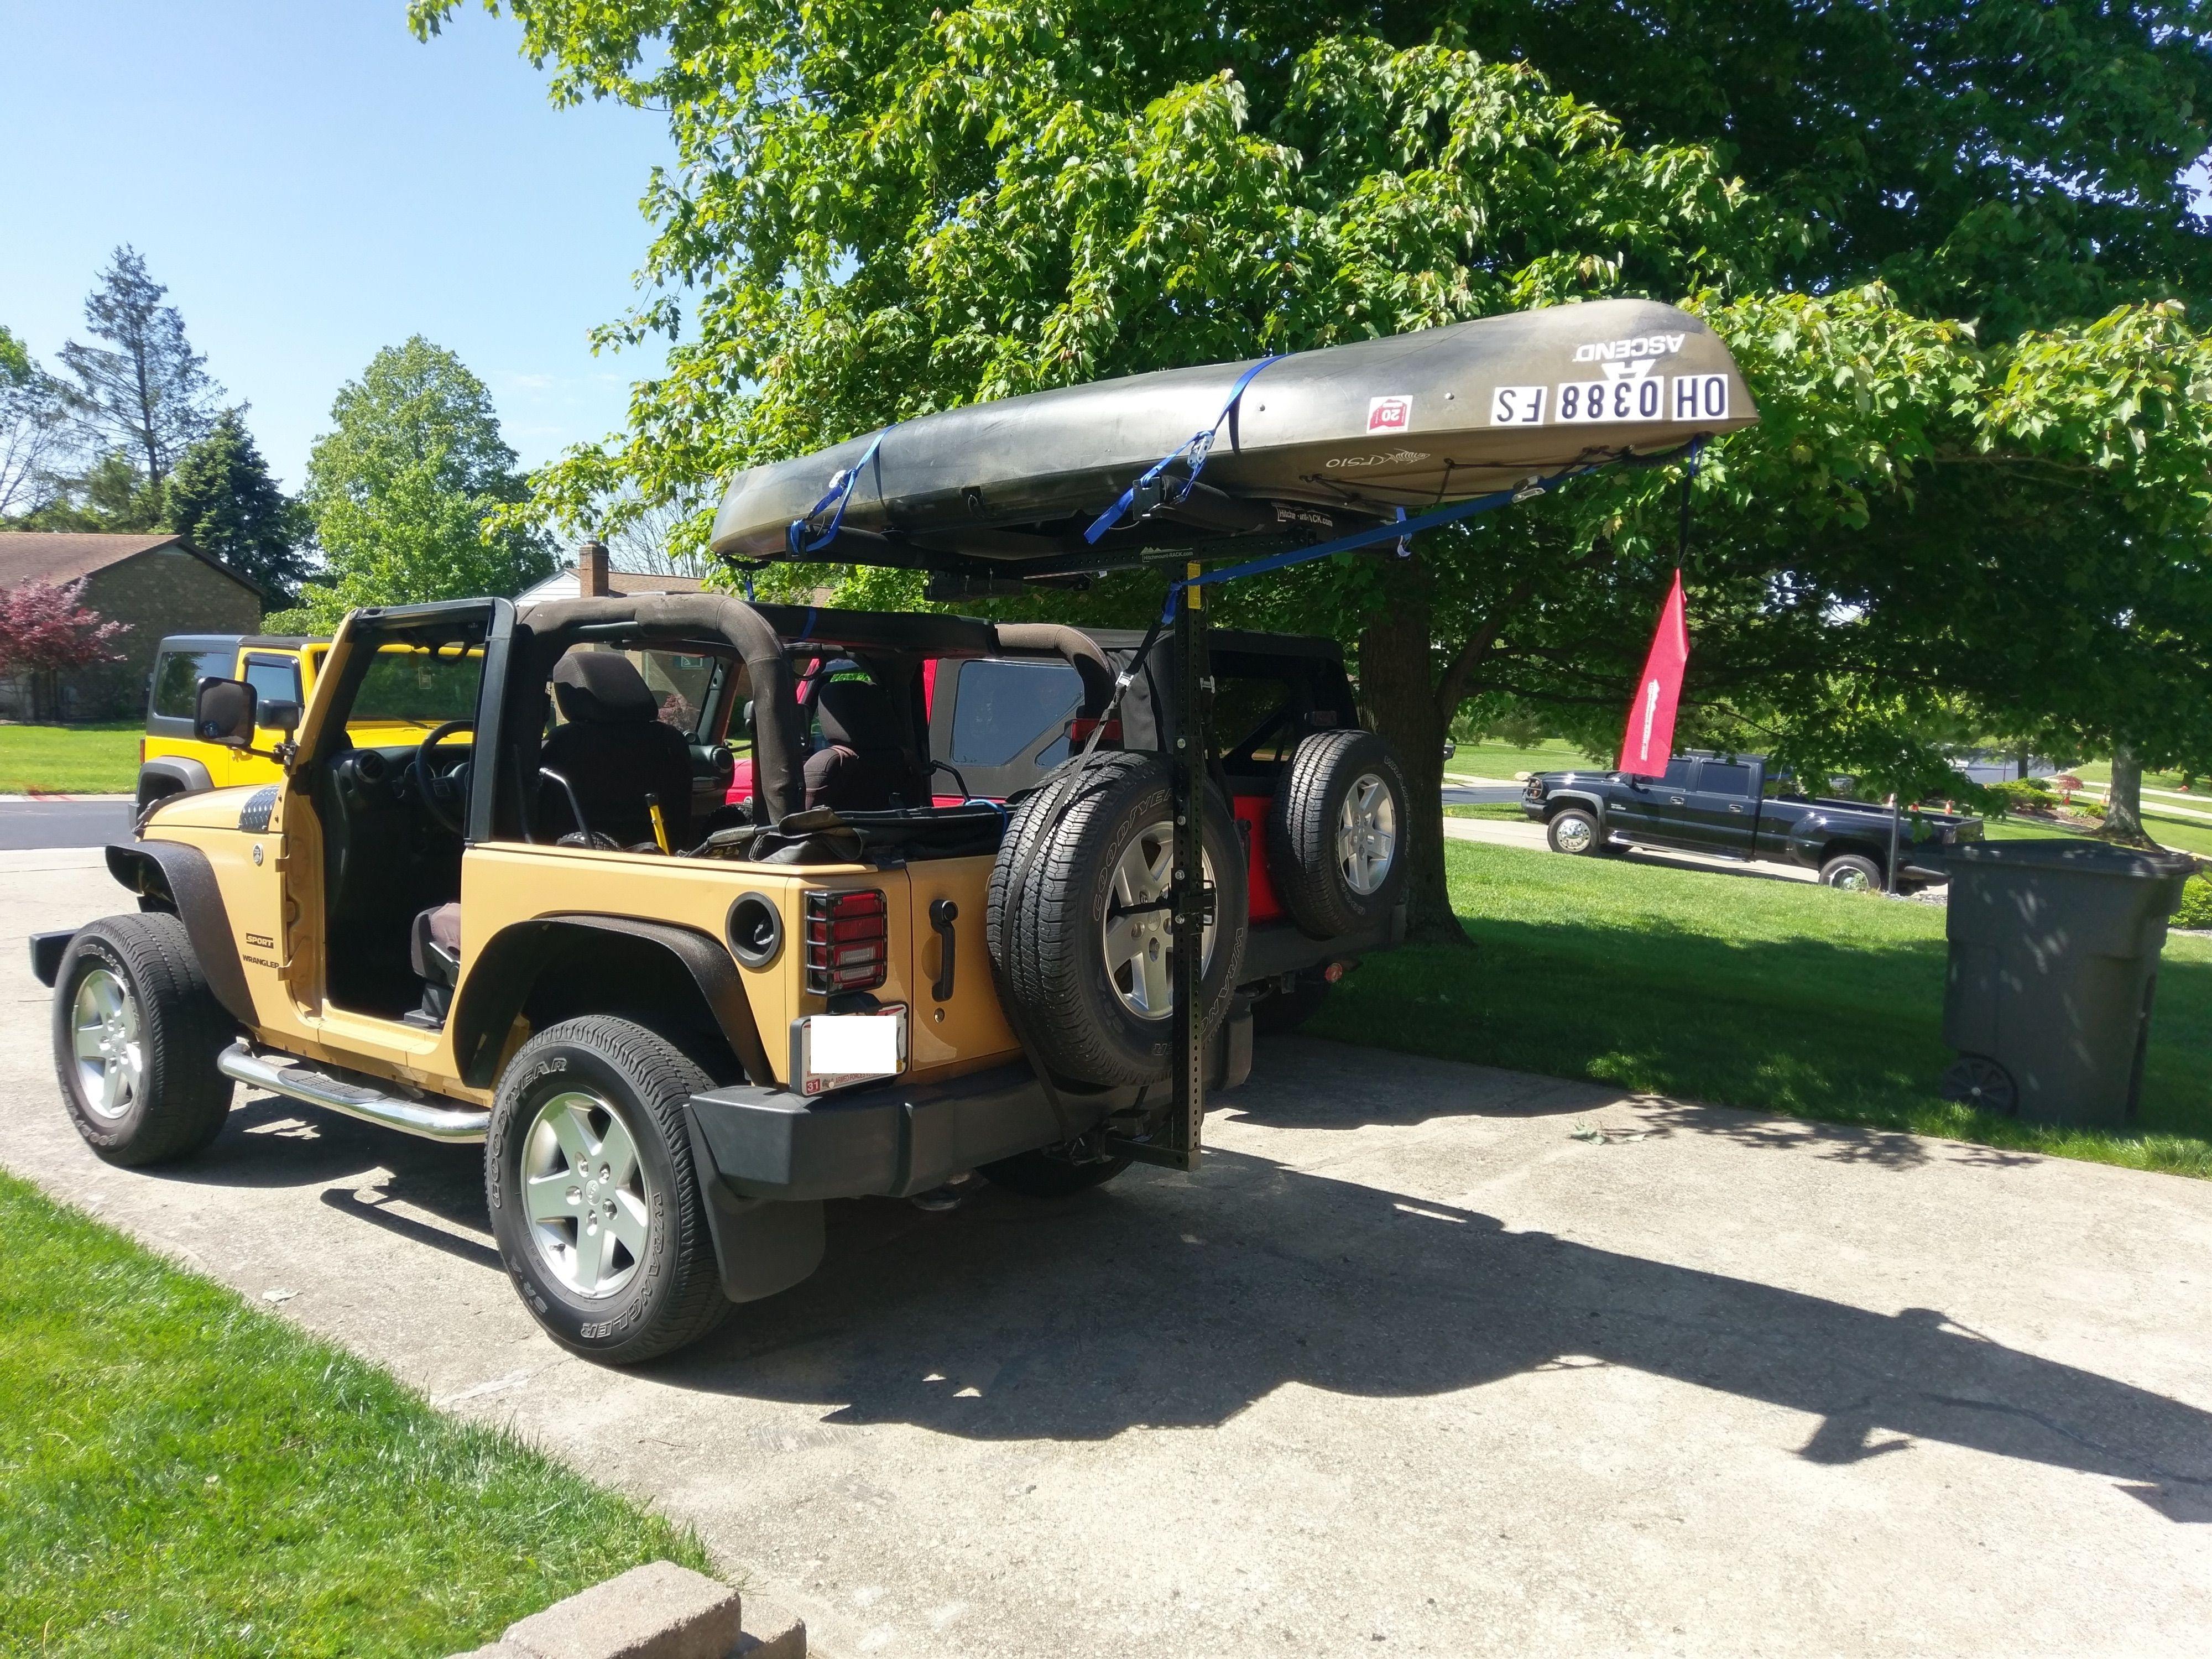 Soft Top Jeep Kayak Rack Kayak Rack Kayaking Jeep